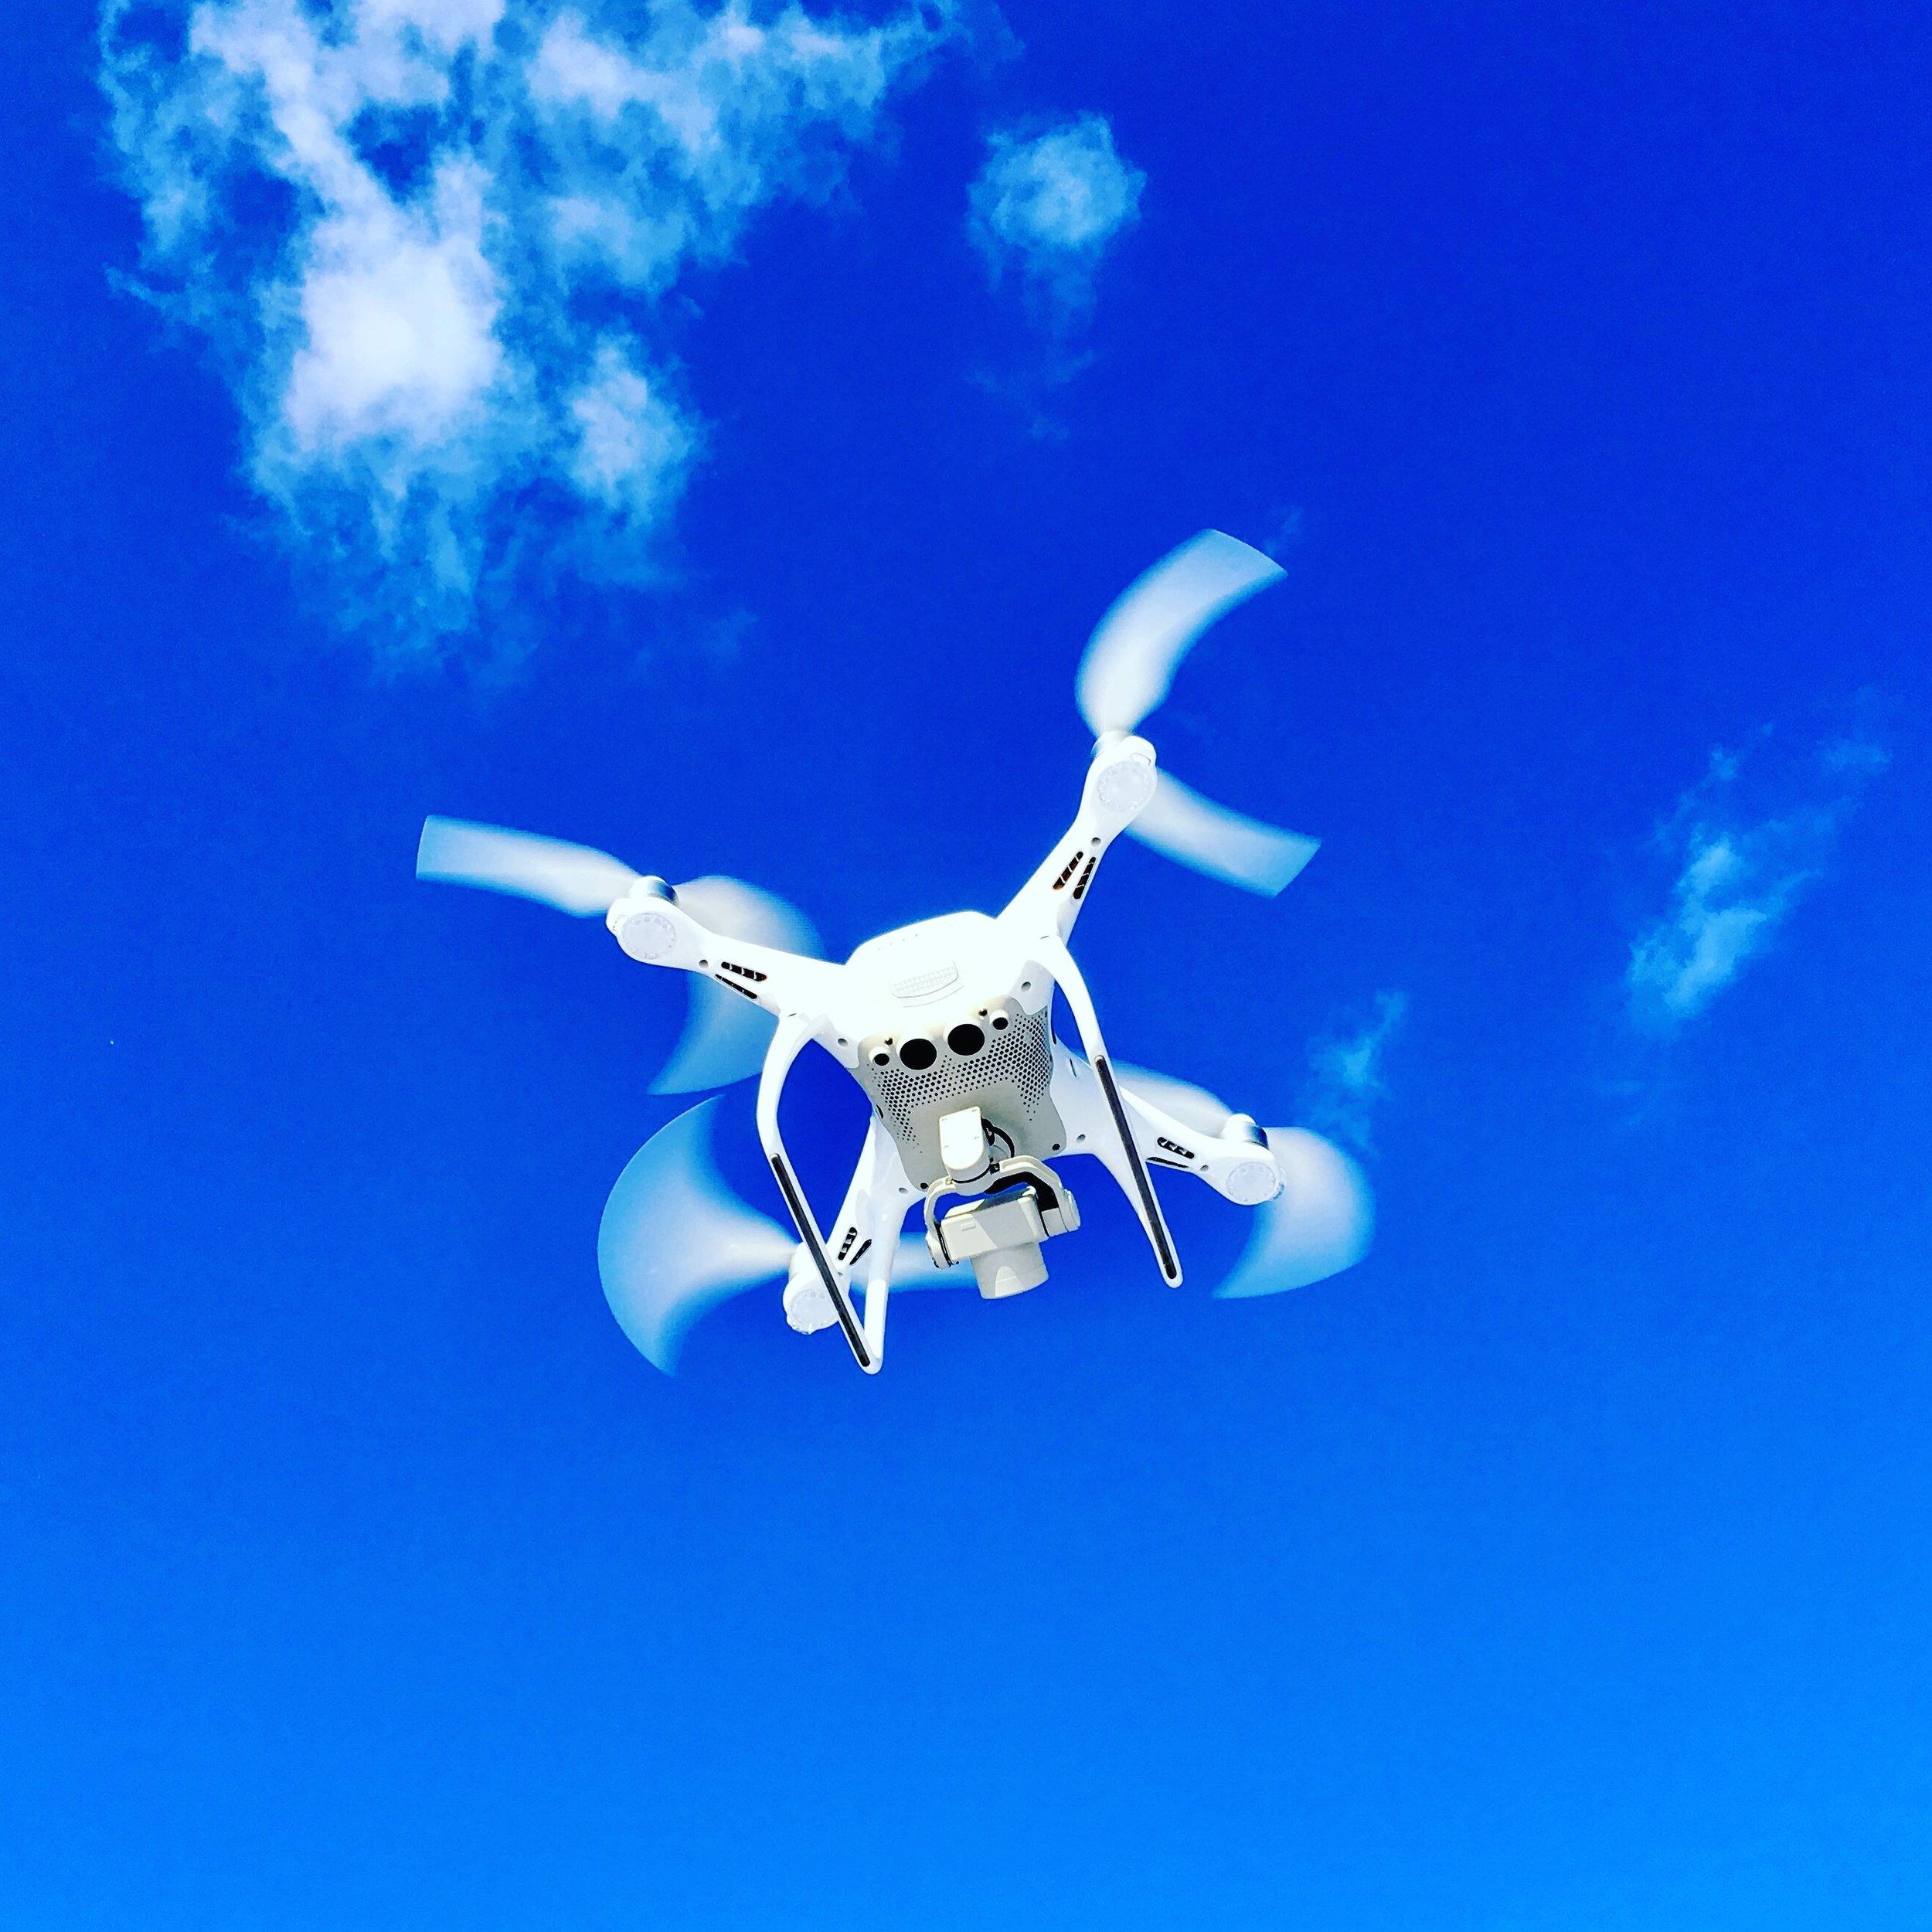 Virginia_drone_testing_2016.JPG